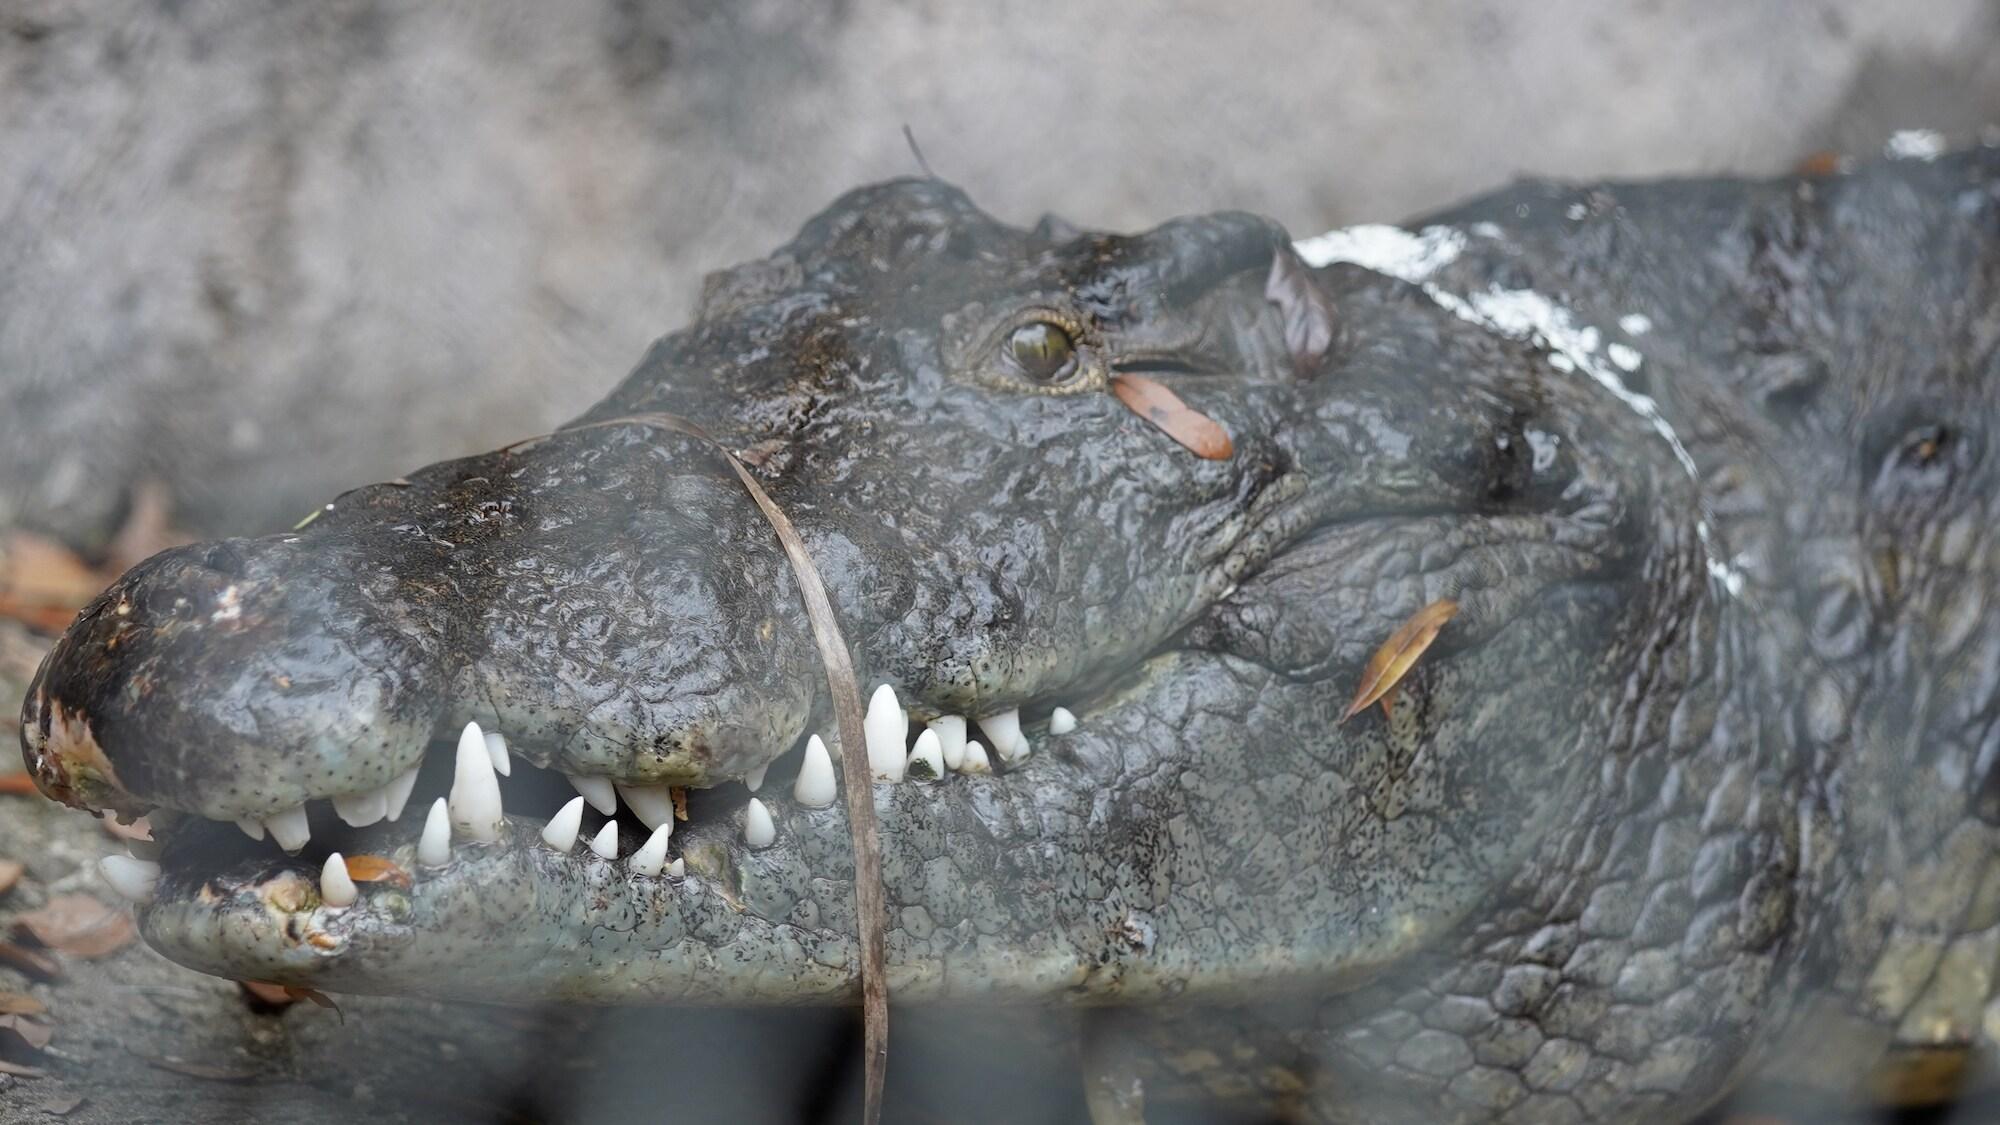 Mr. Campbell the Nile crocodile. (Disney)